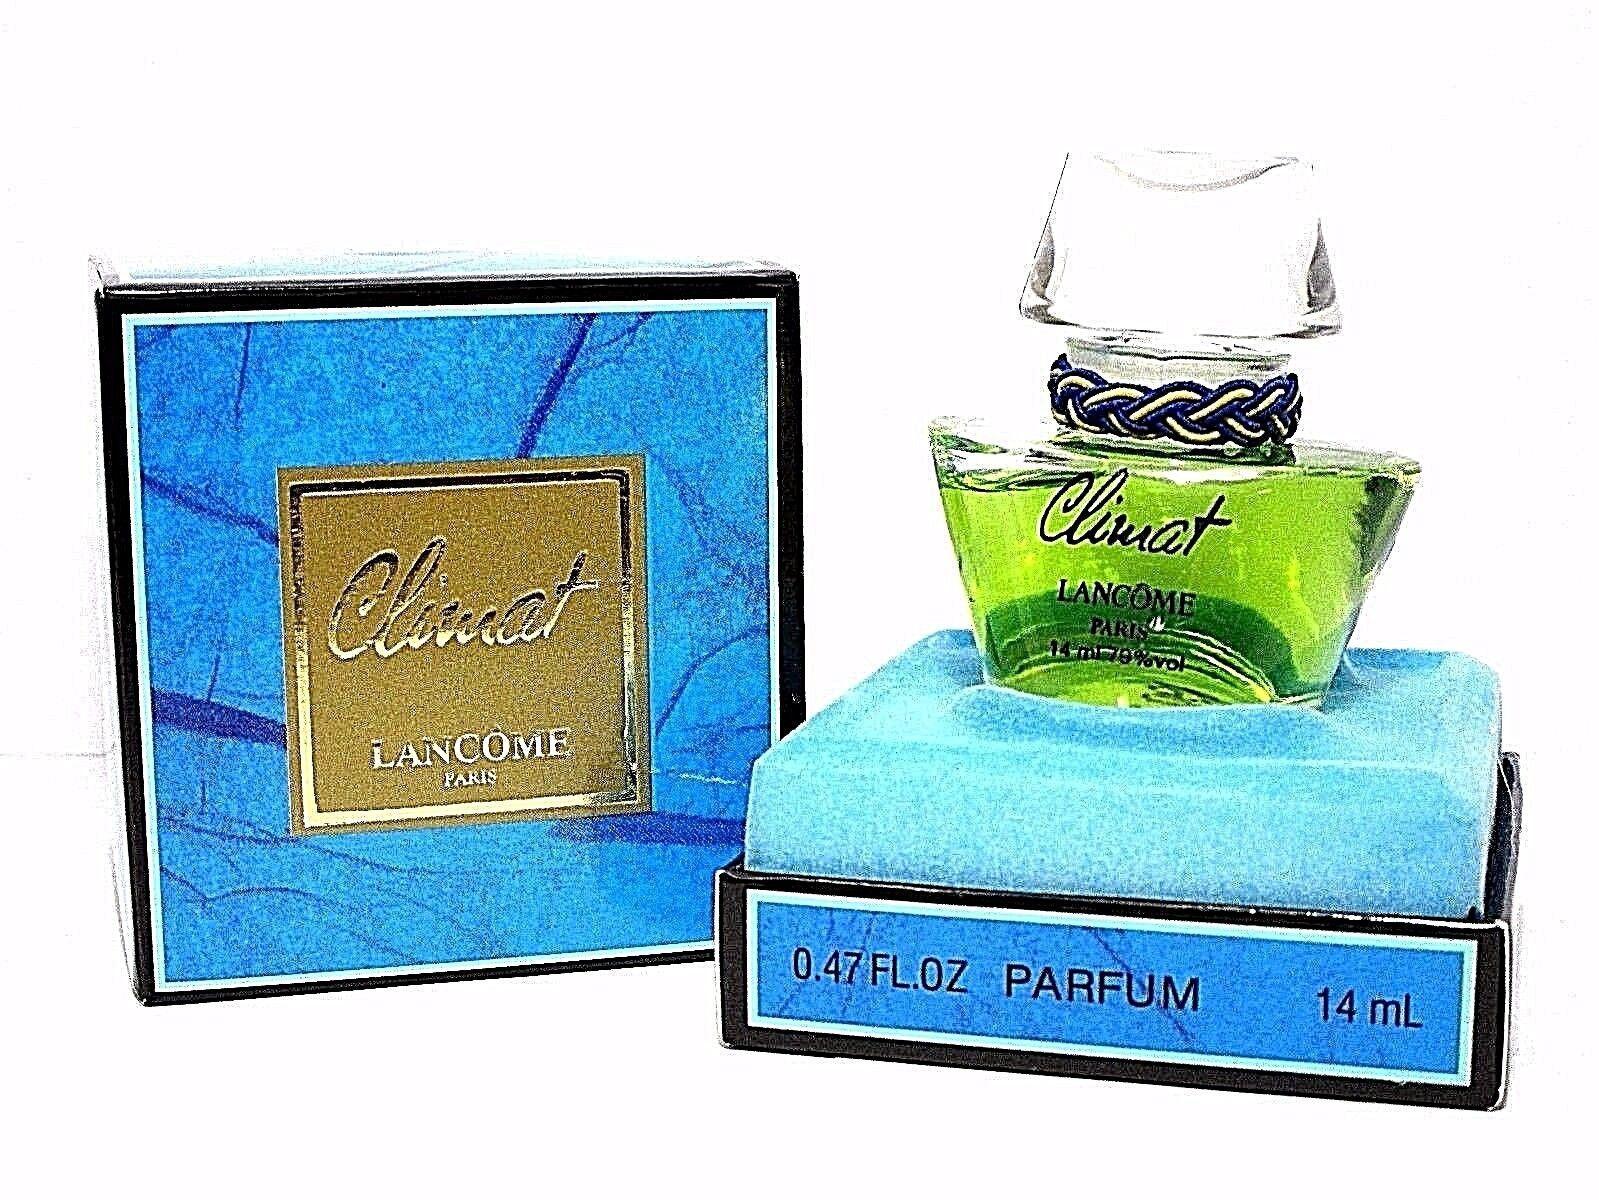 LANCOME CLIMAT Pure Parfum Splash 0.47 Oz   14 ml RARE ITEM NEW SEALED IN  BOX 8ce9cf8185fa5